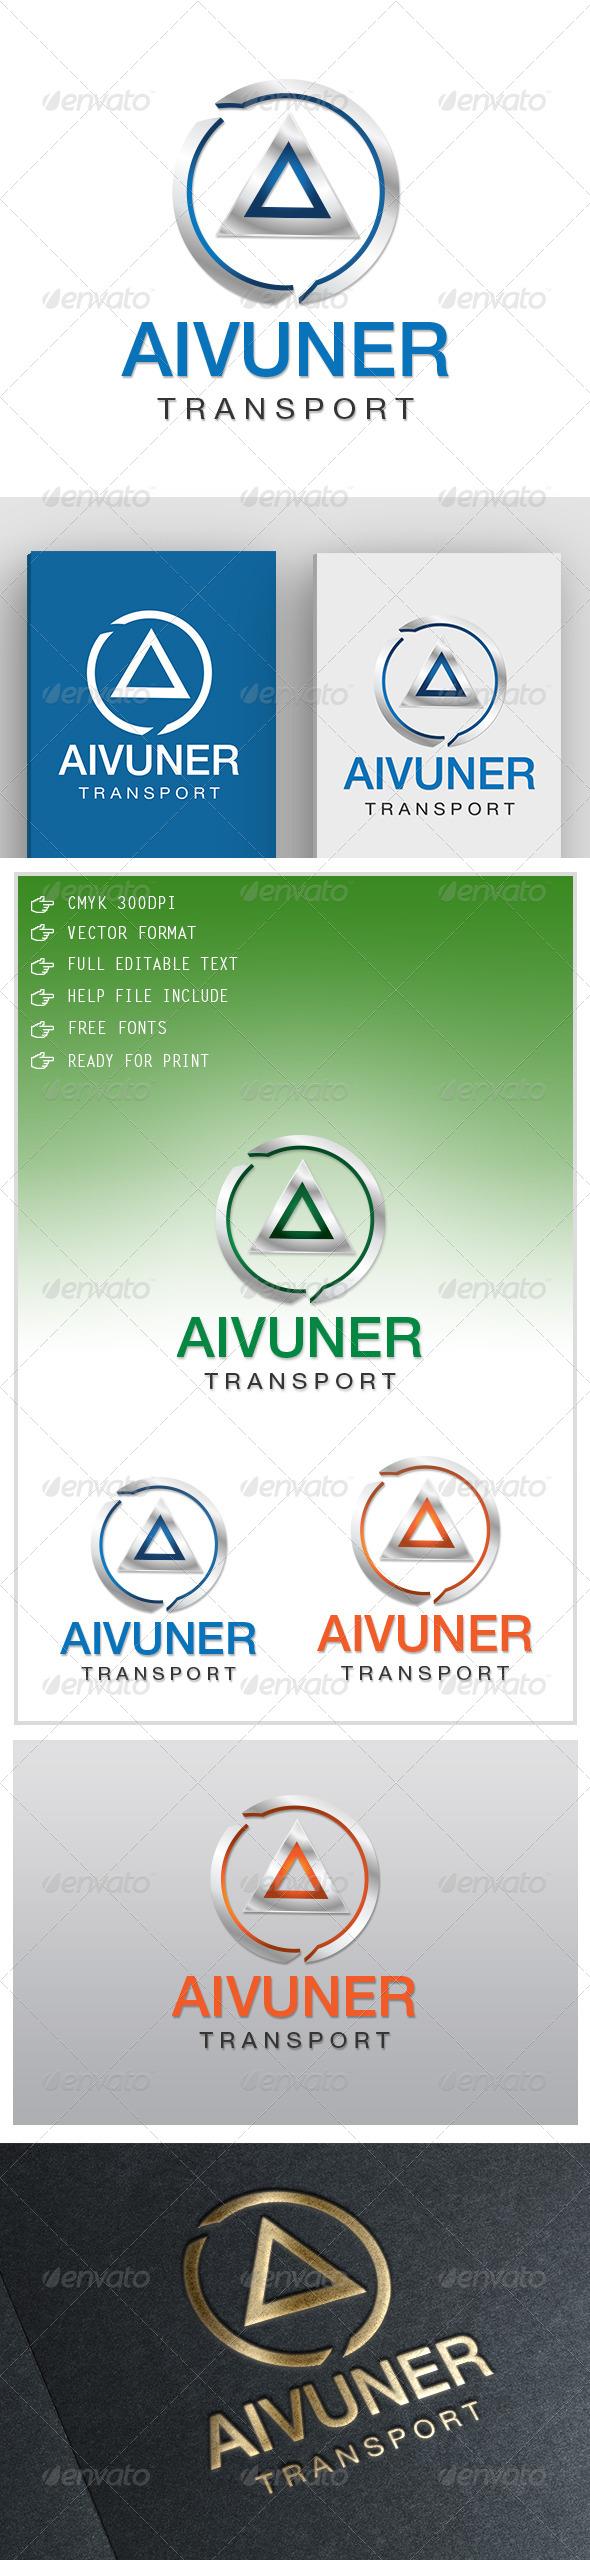 GraphicRiver Aivuner Transport Logo 5564314